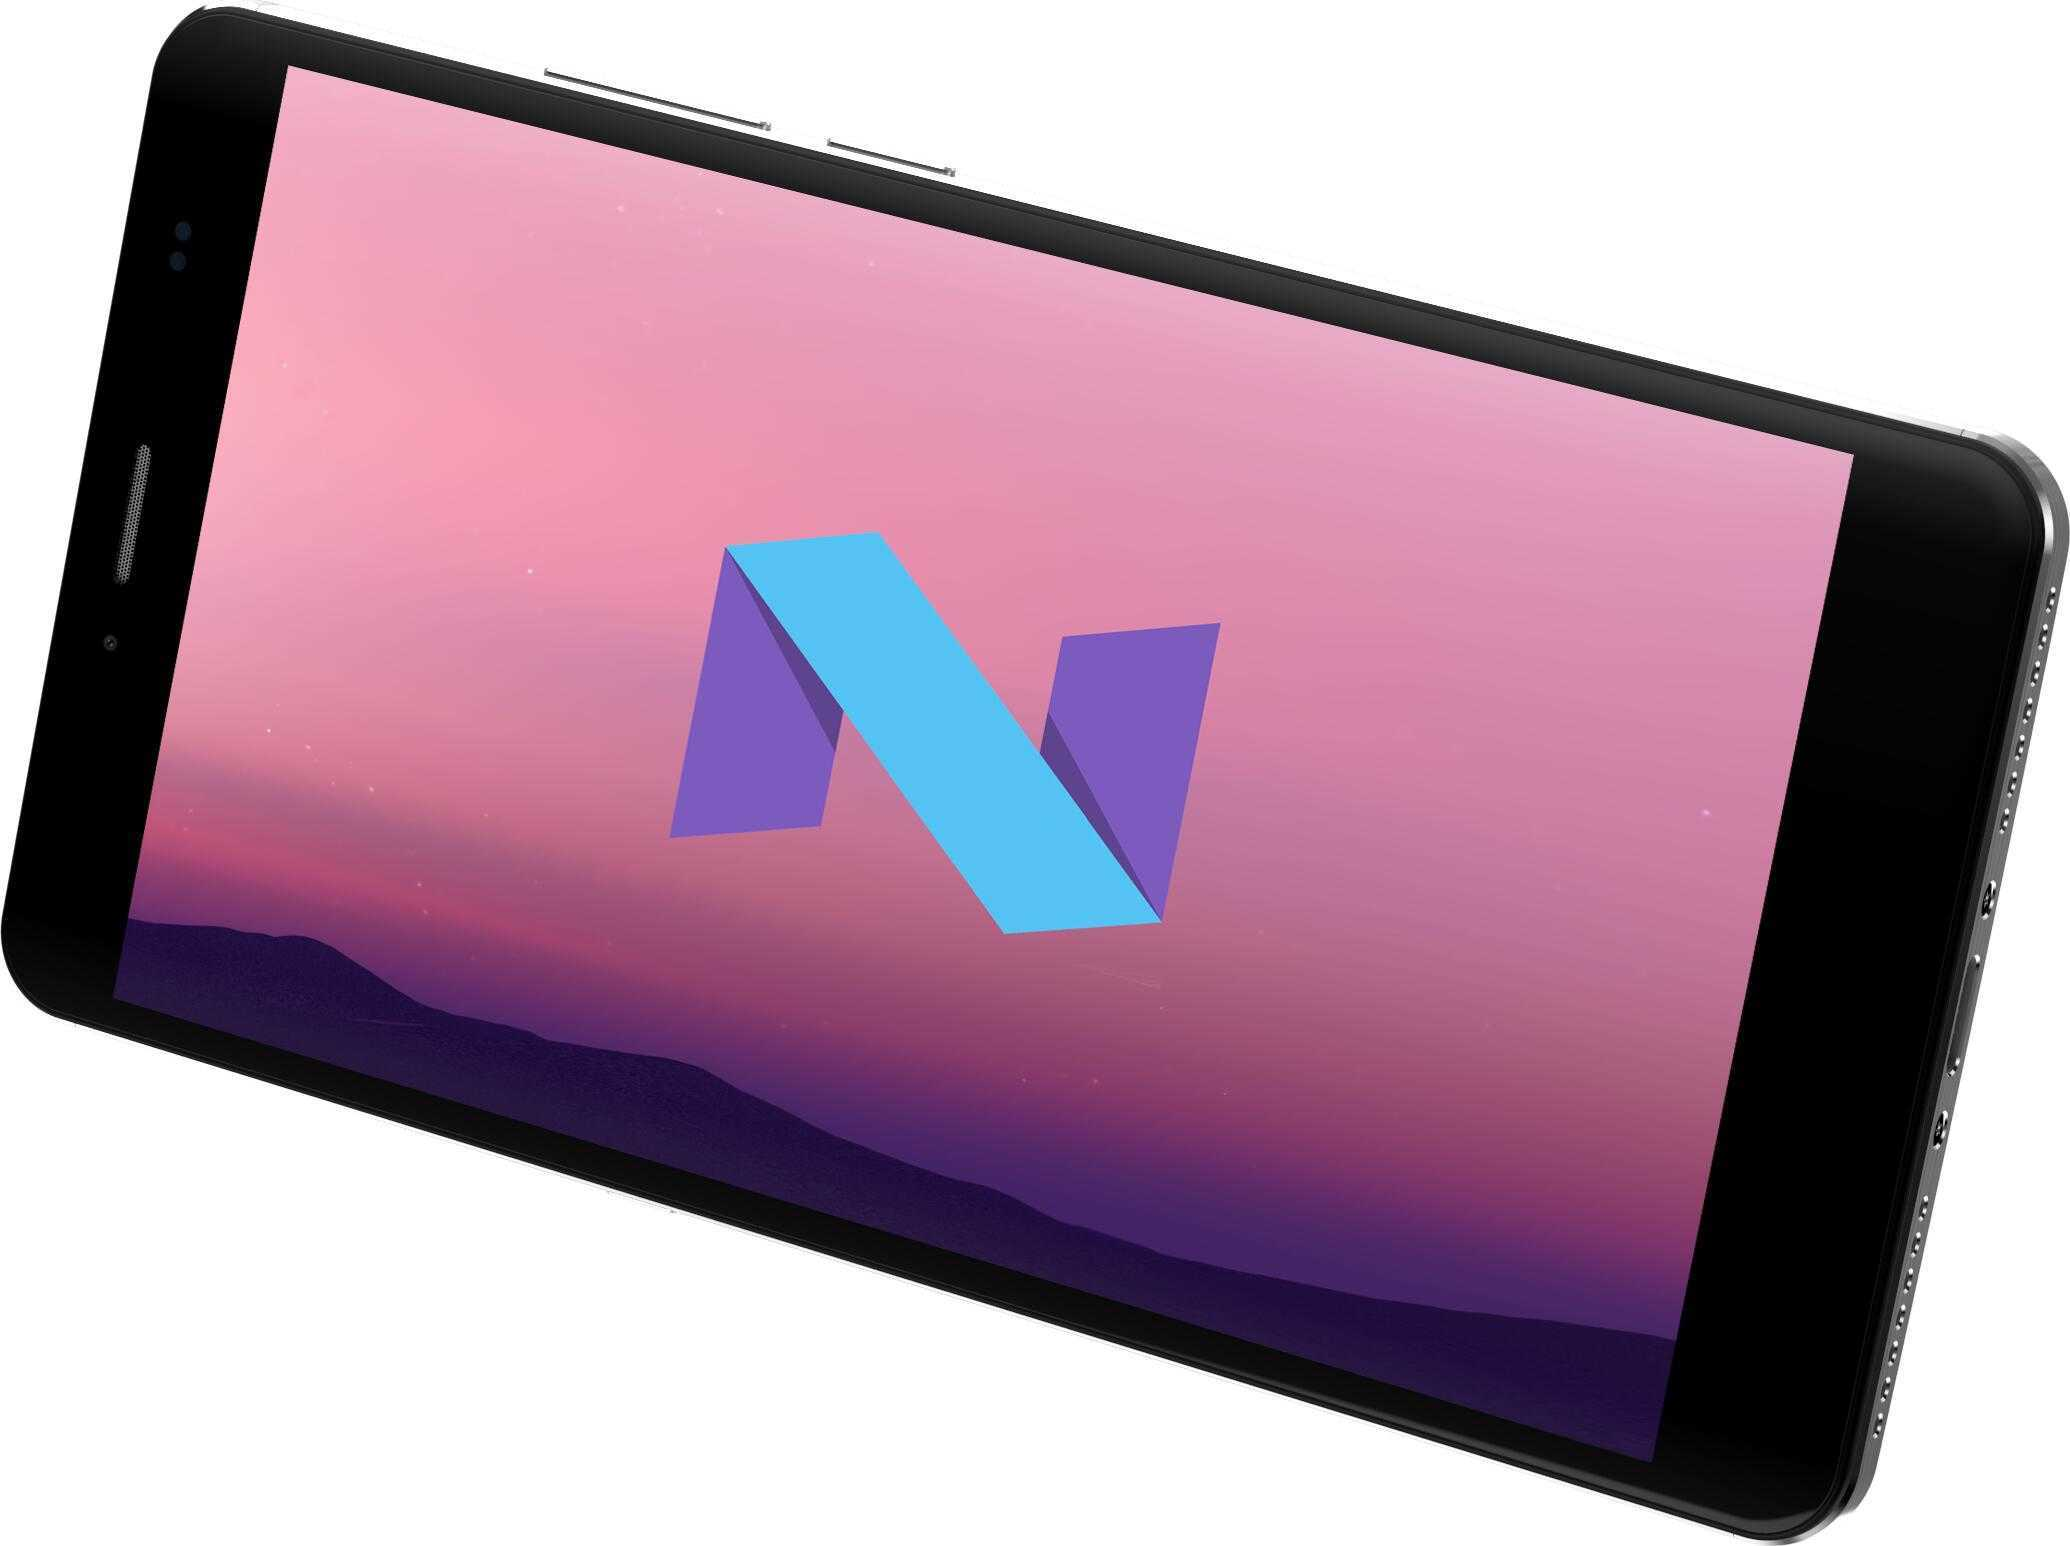 Bluboo Maya Max Android 7.0 Nougat Update